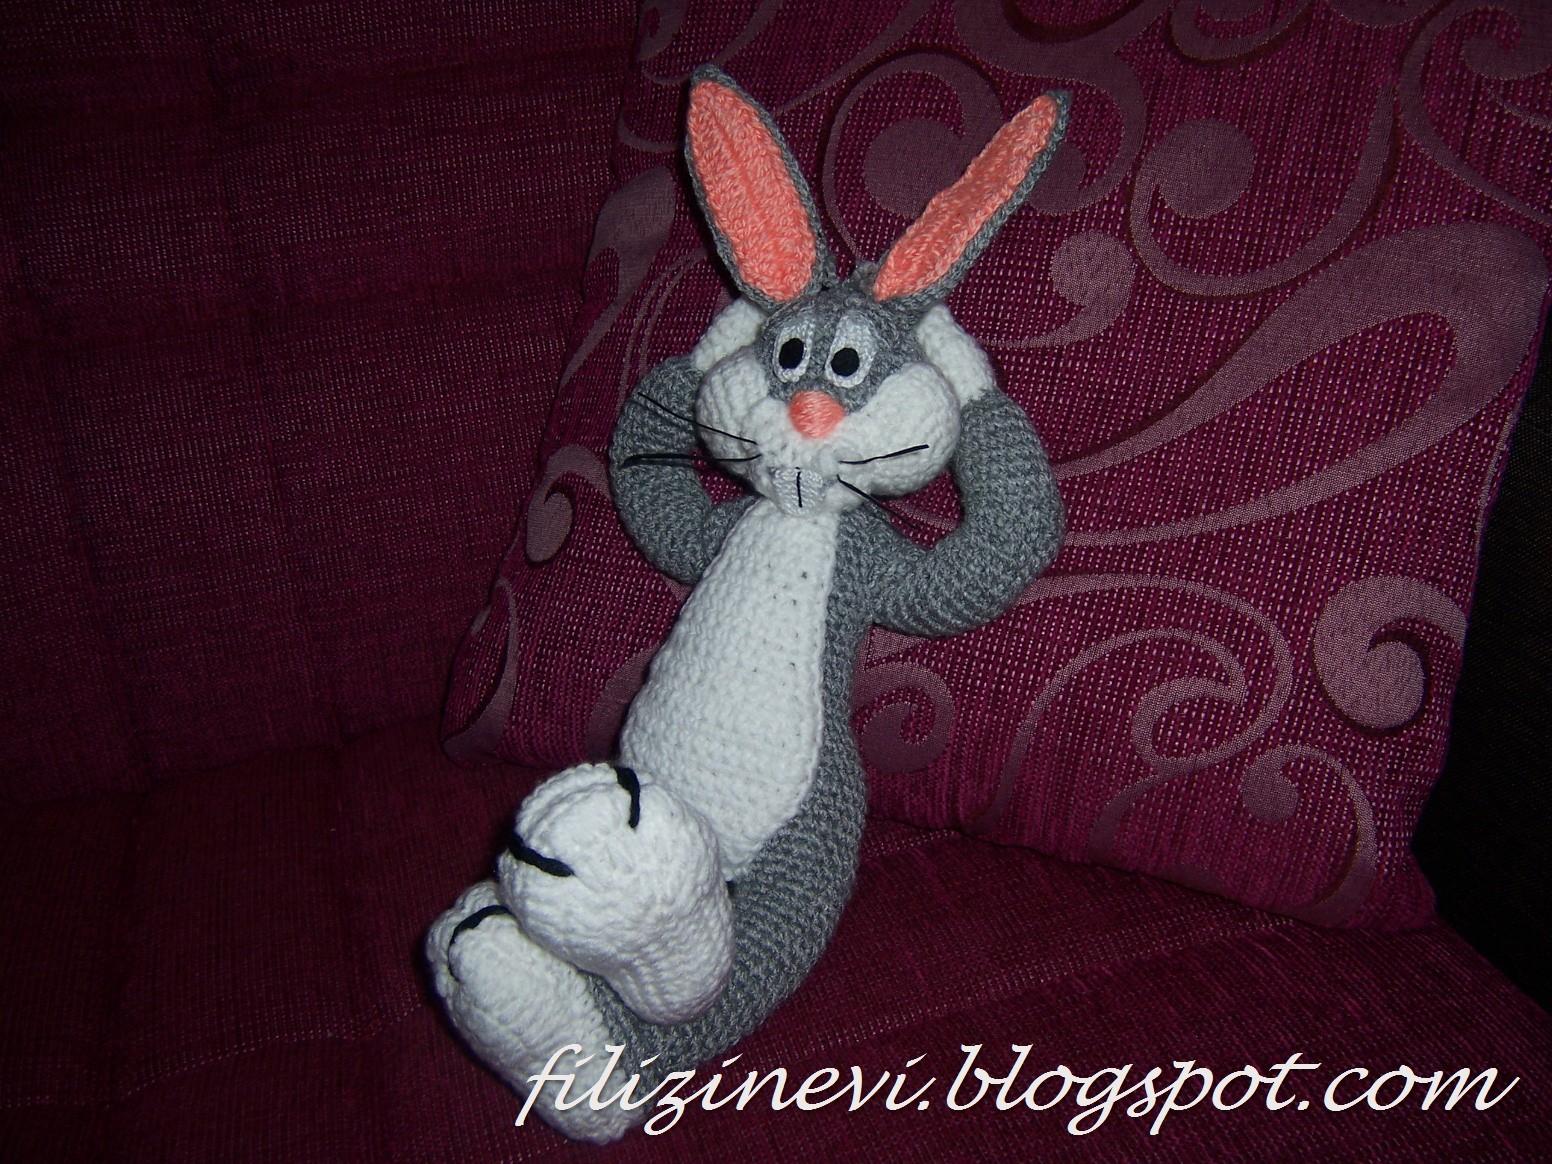 Amigurumi Bugs Bunny Yapilisi : F?L?Z?N EV?: AM?GURUM? BUGS BUNNY